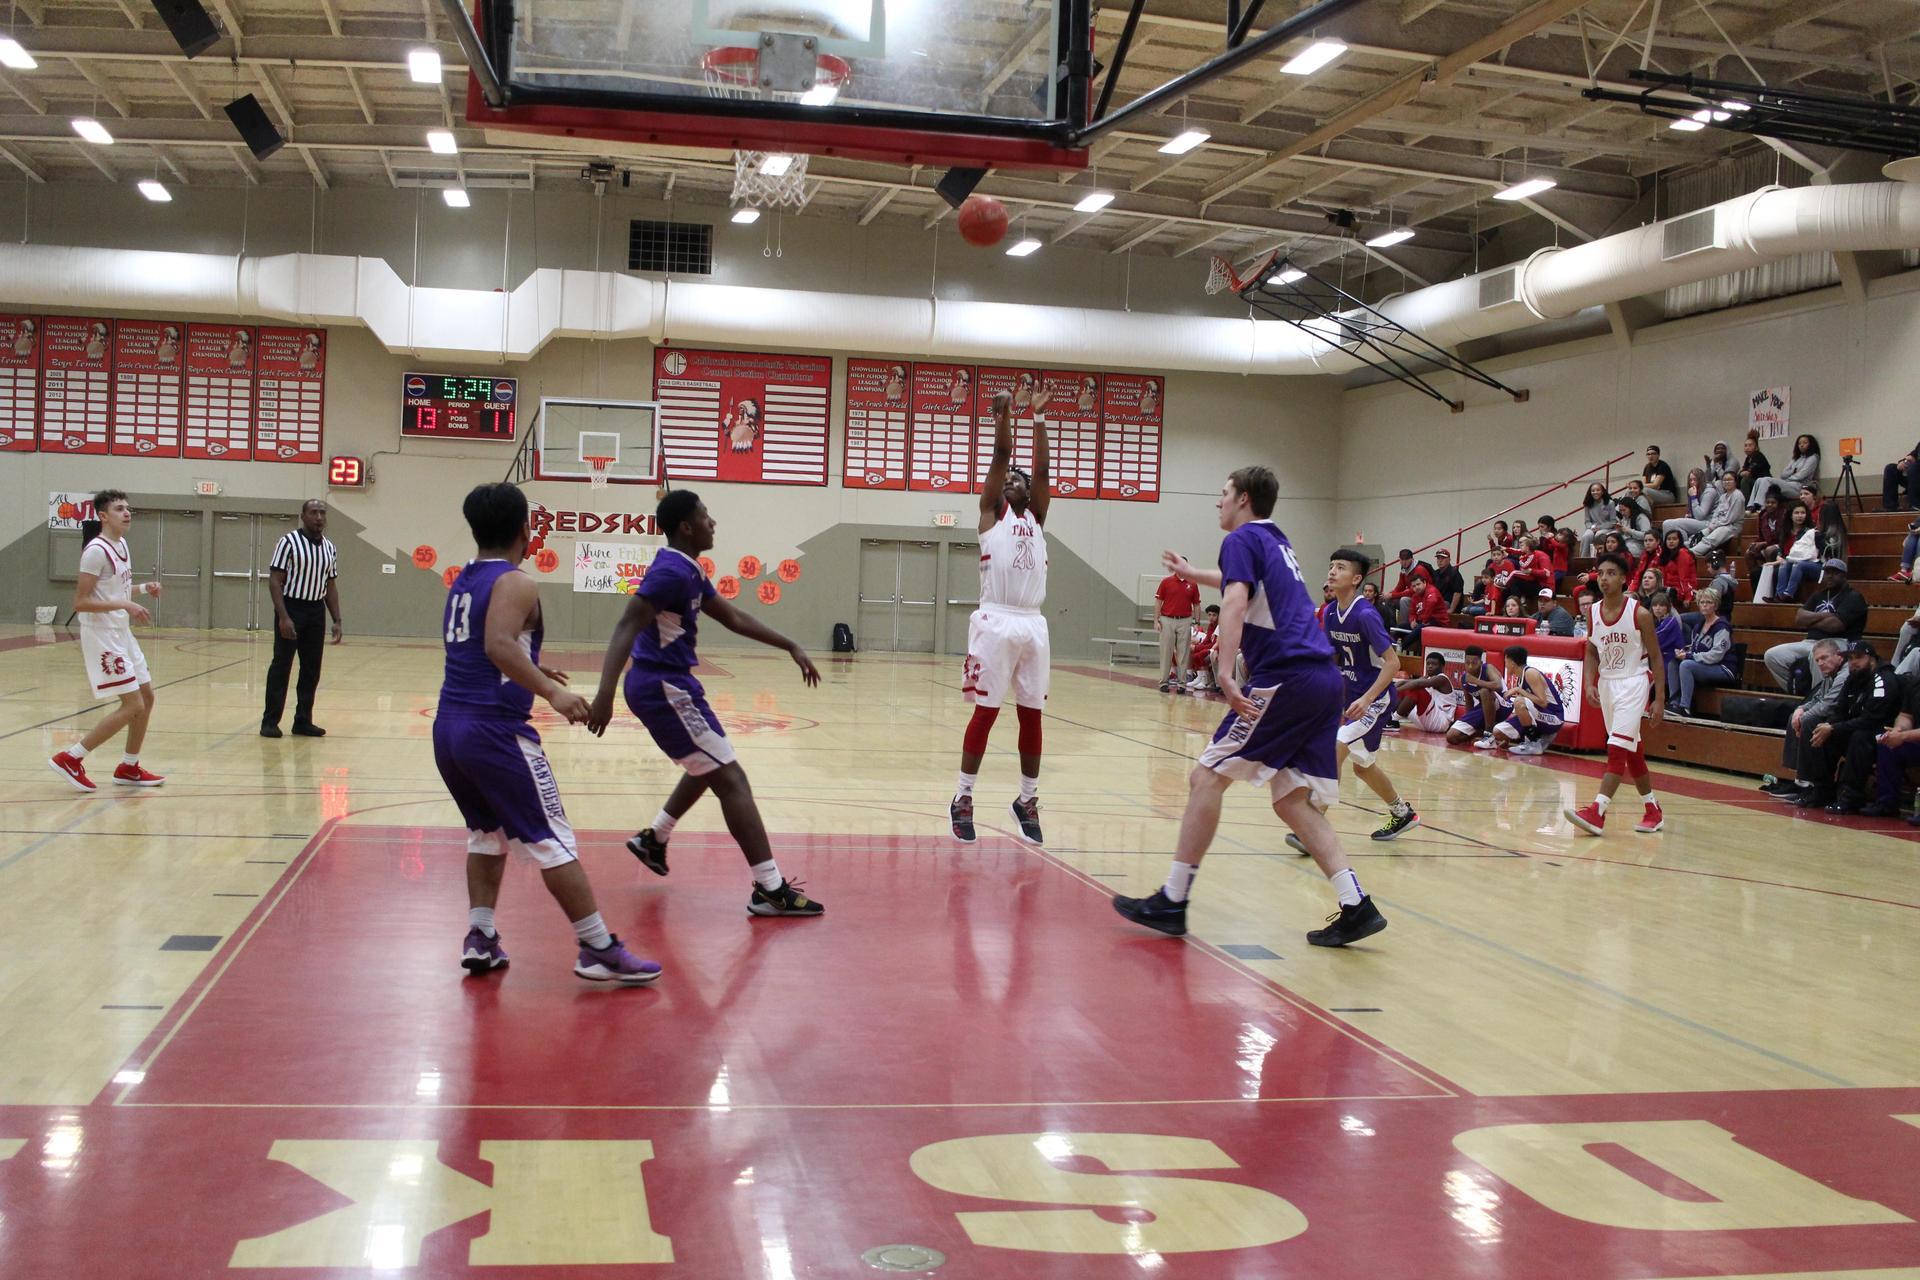 Athletes at Basket Ball Game vs Union